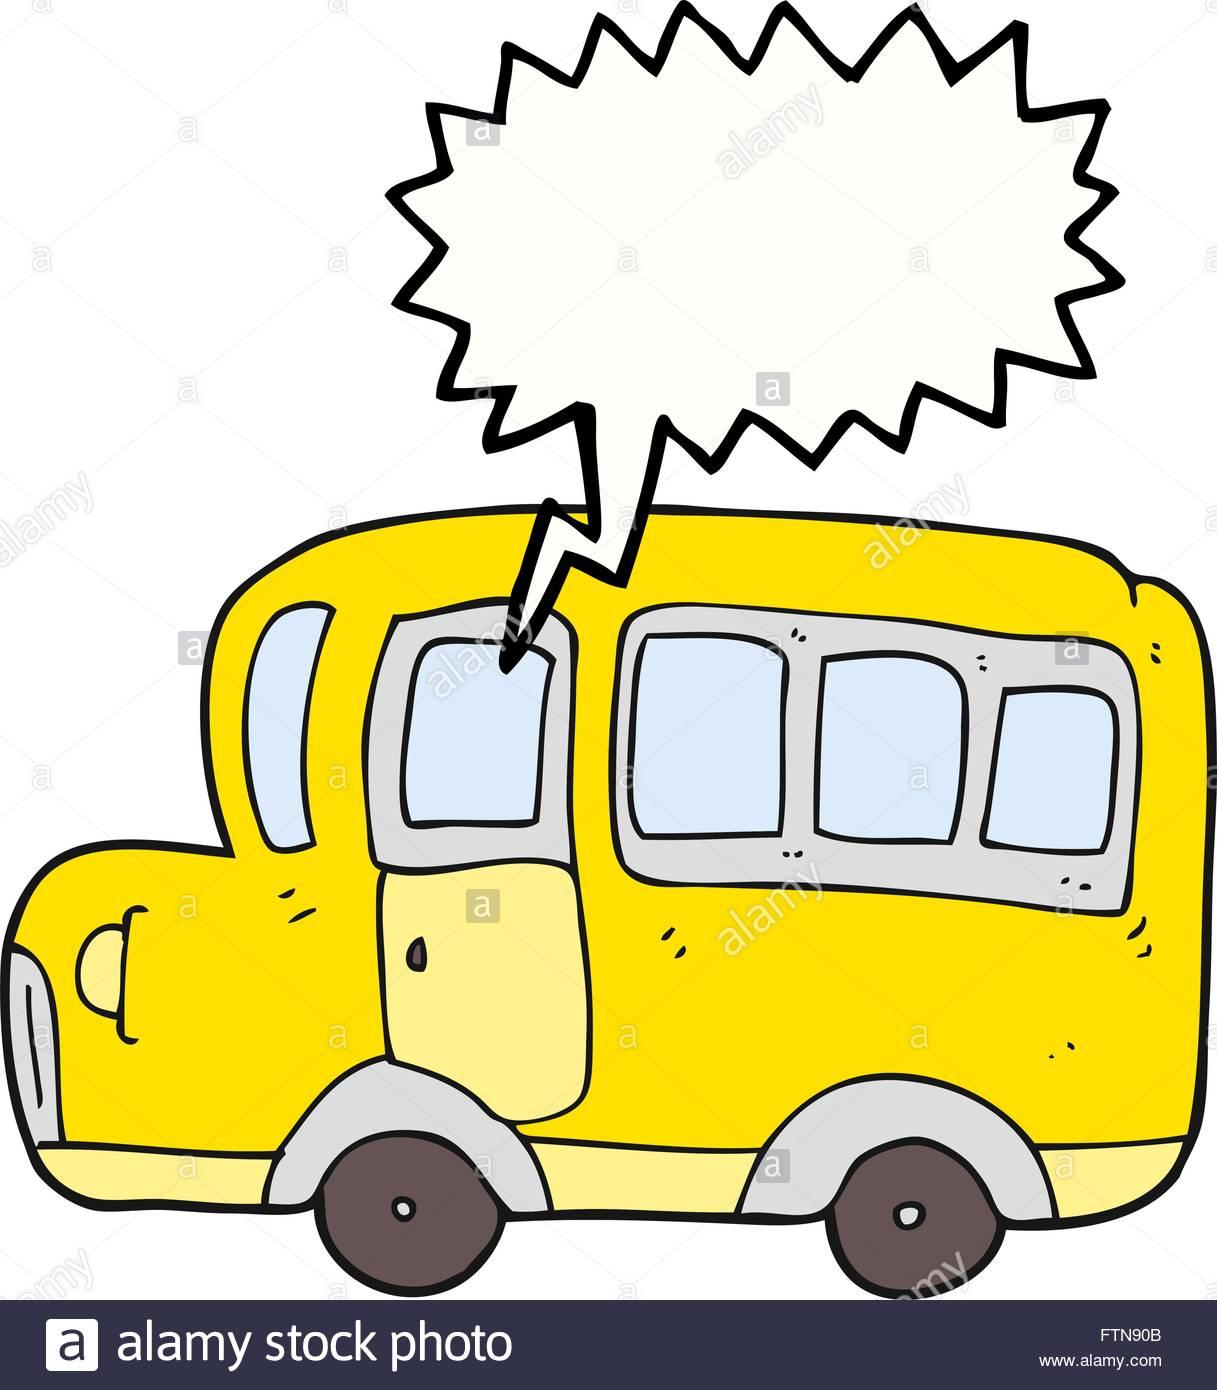 1217x1390 Freehand Drawn Speech Bubble Cartoon Yellow School Bus Stock